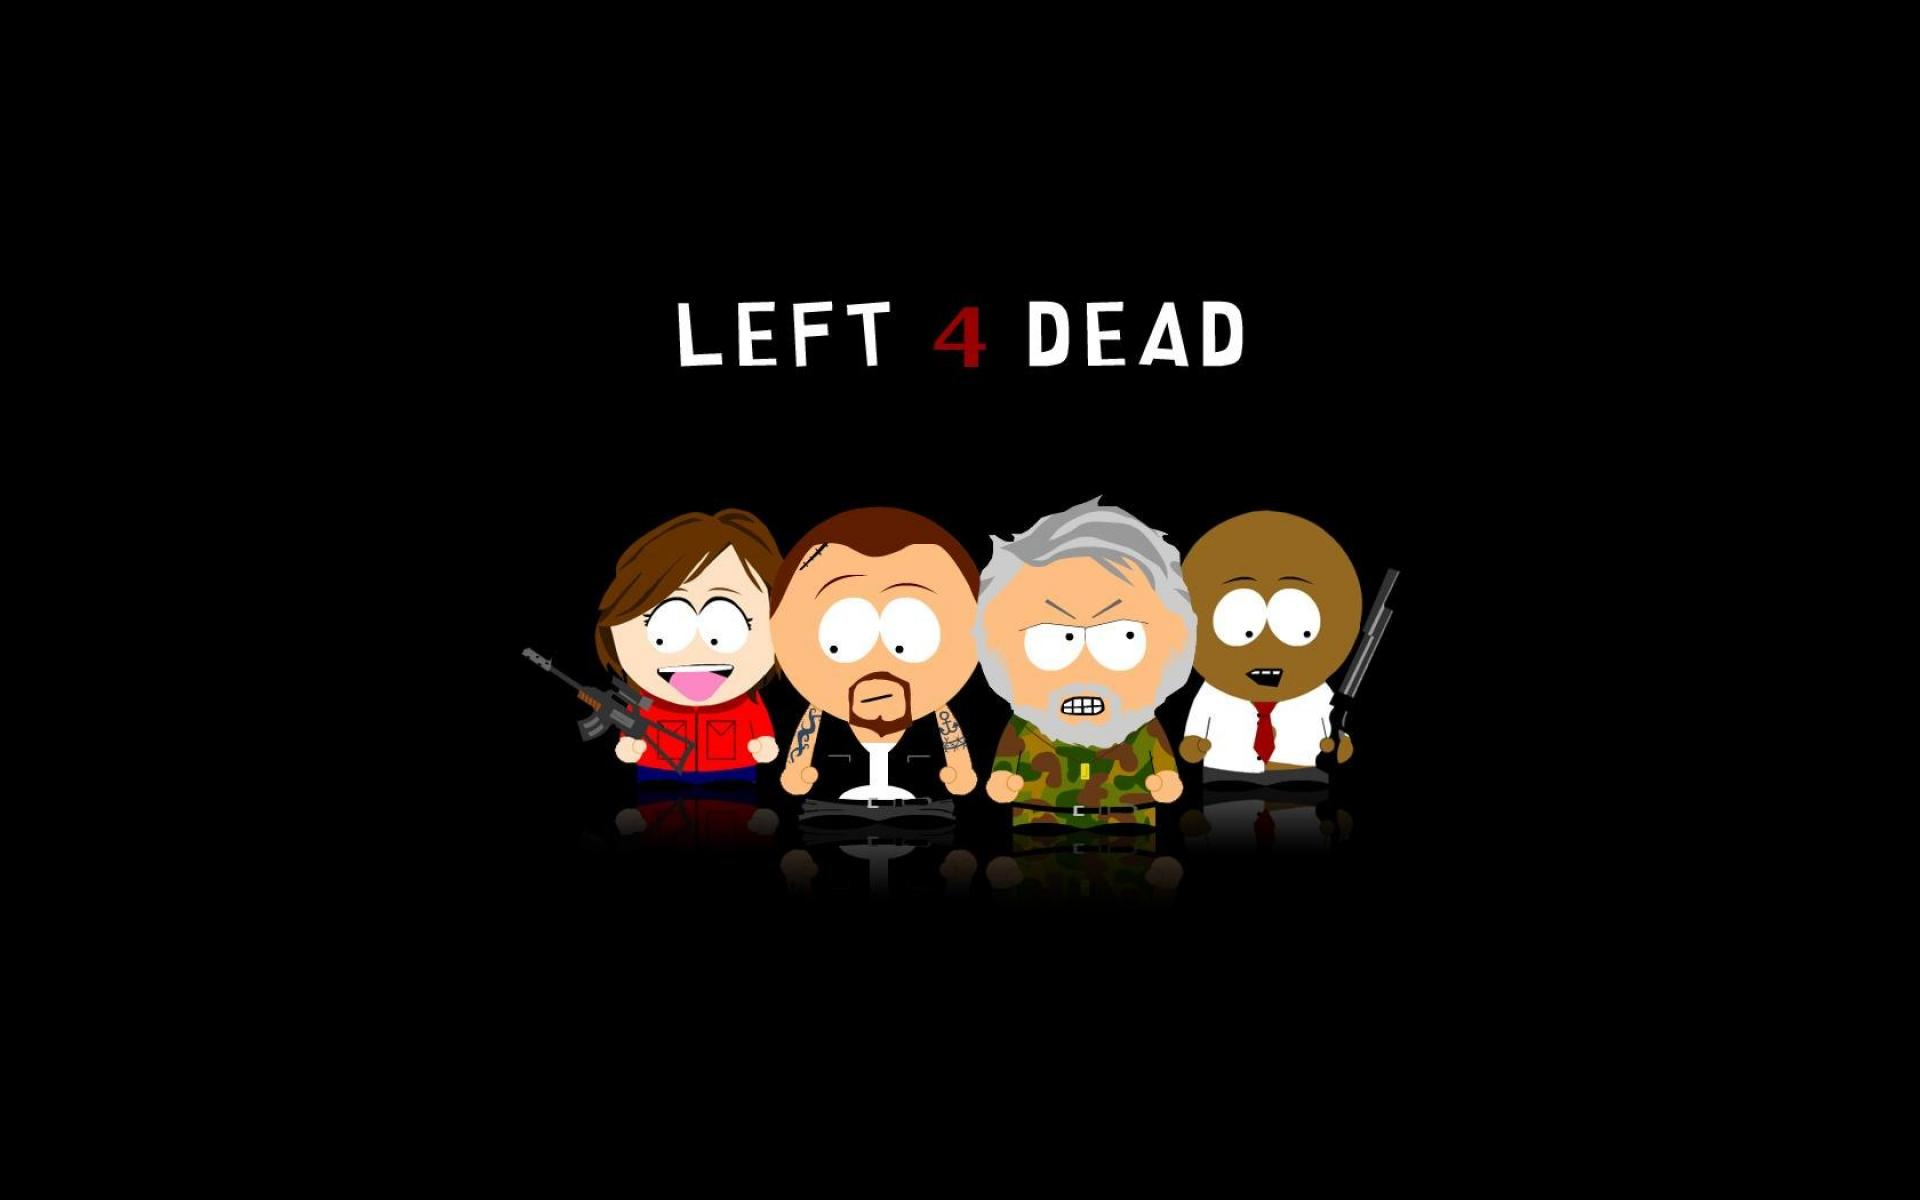 South Park wallpaper 6